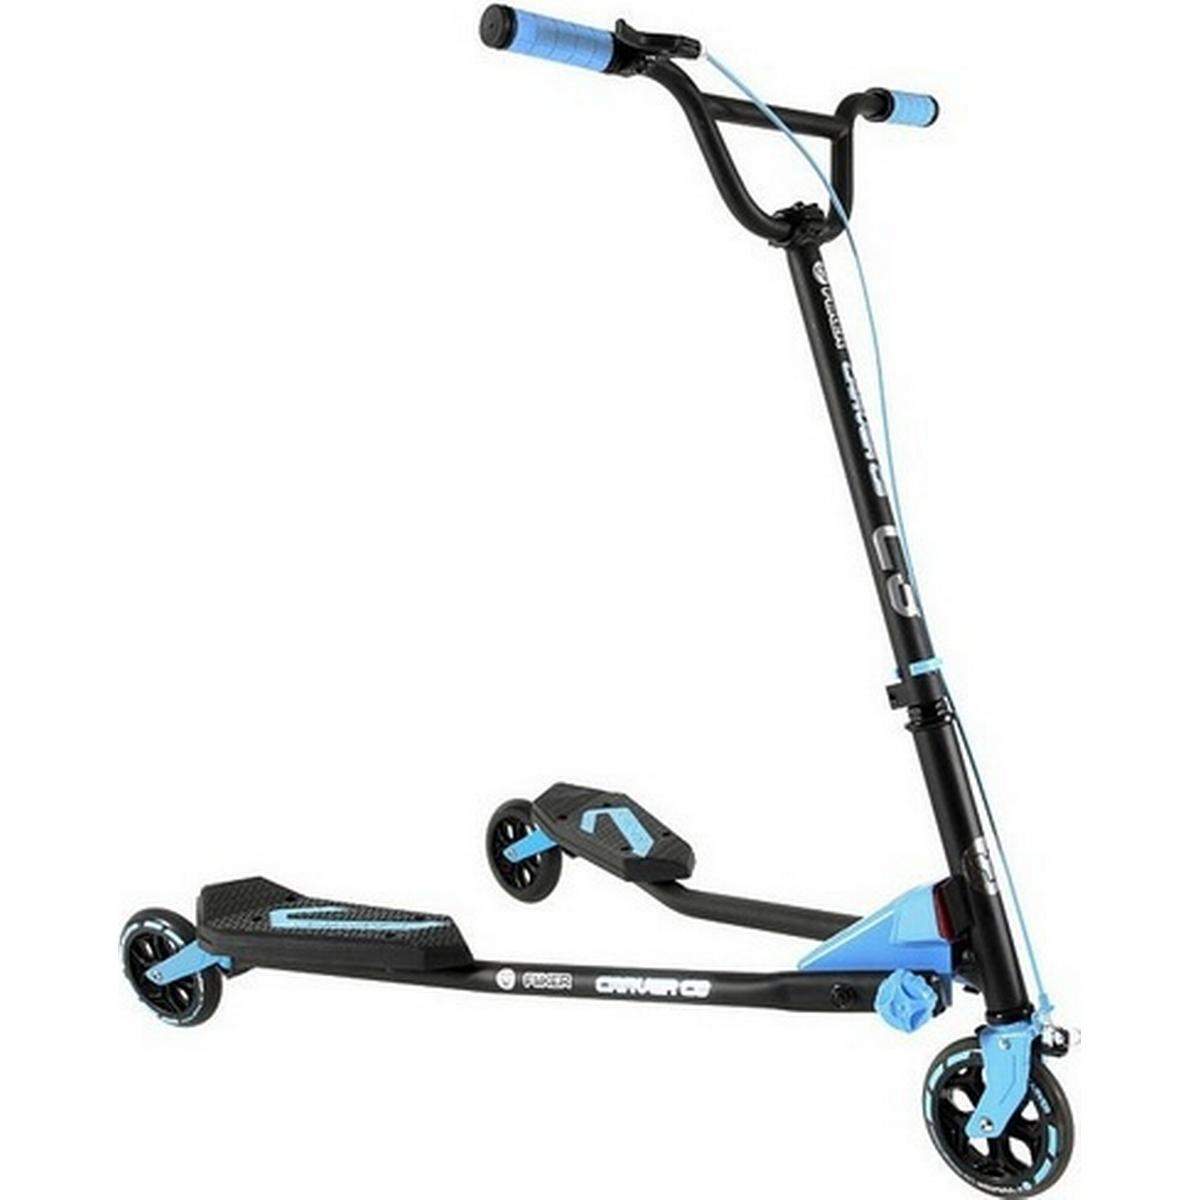 Yvolution Sparkcykel 4 Produkter Hos Pricerunner Se